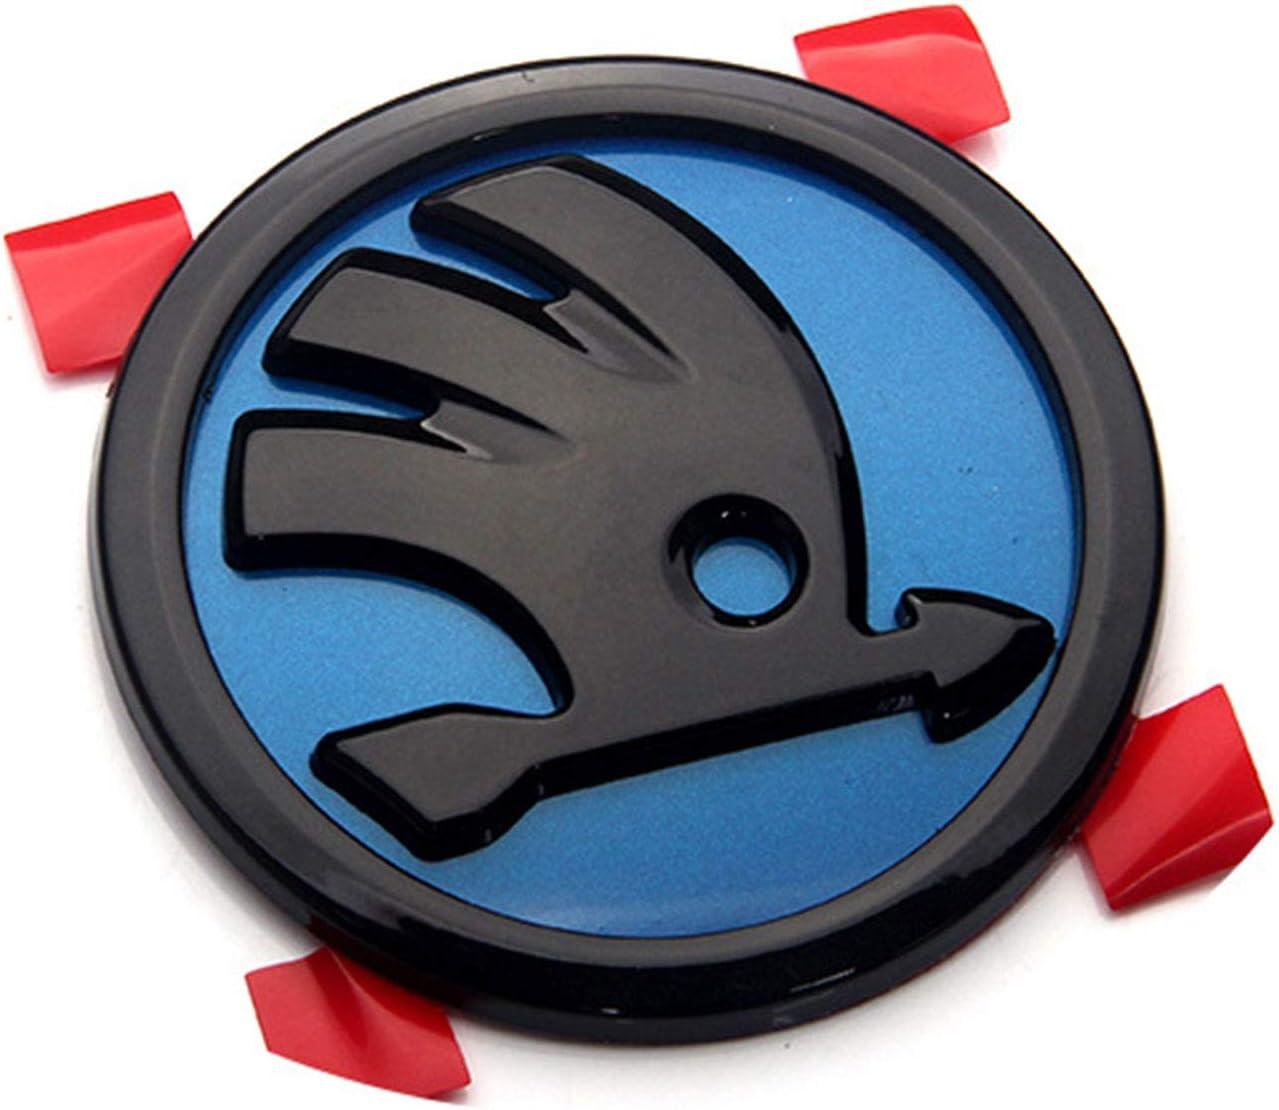 None//Brand Car Styling Medio Rejilla Frontal Posterior del Tronco del Emblema De Reemplazo Etiqueta Engomada del Logotipo De S-Koda Octavia Magn/ífico Frontal ,Azul 90 Mm